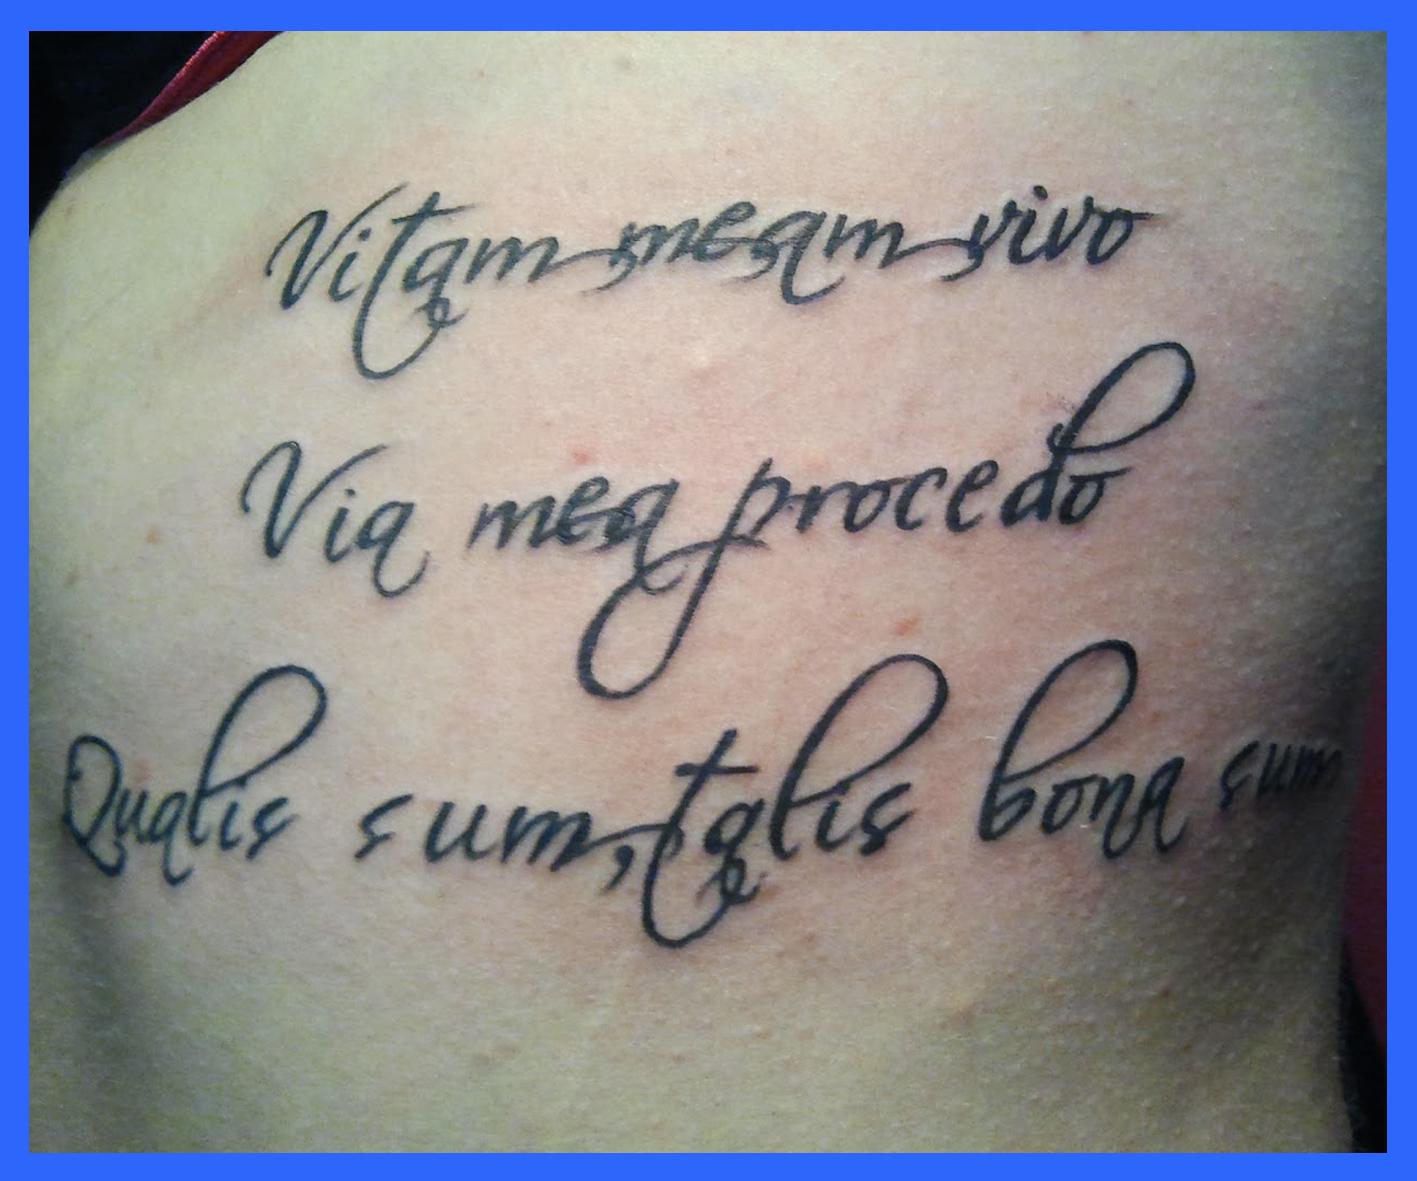 El Tatuaje En Salamanca Estudios Tatuajes Y Tatuadores Letras - Letras-en-latin-para-tatuajes